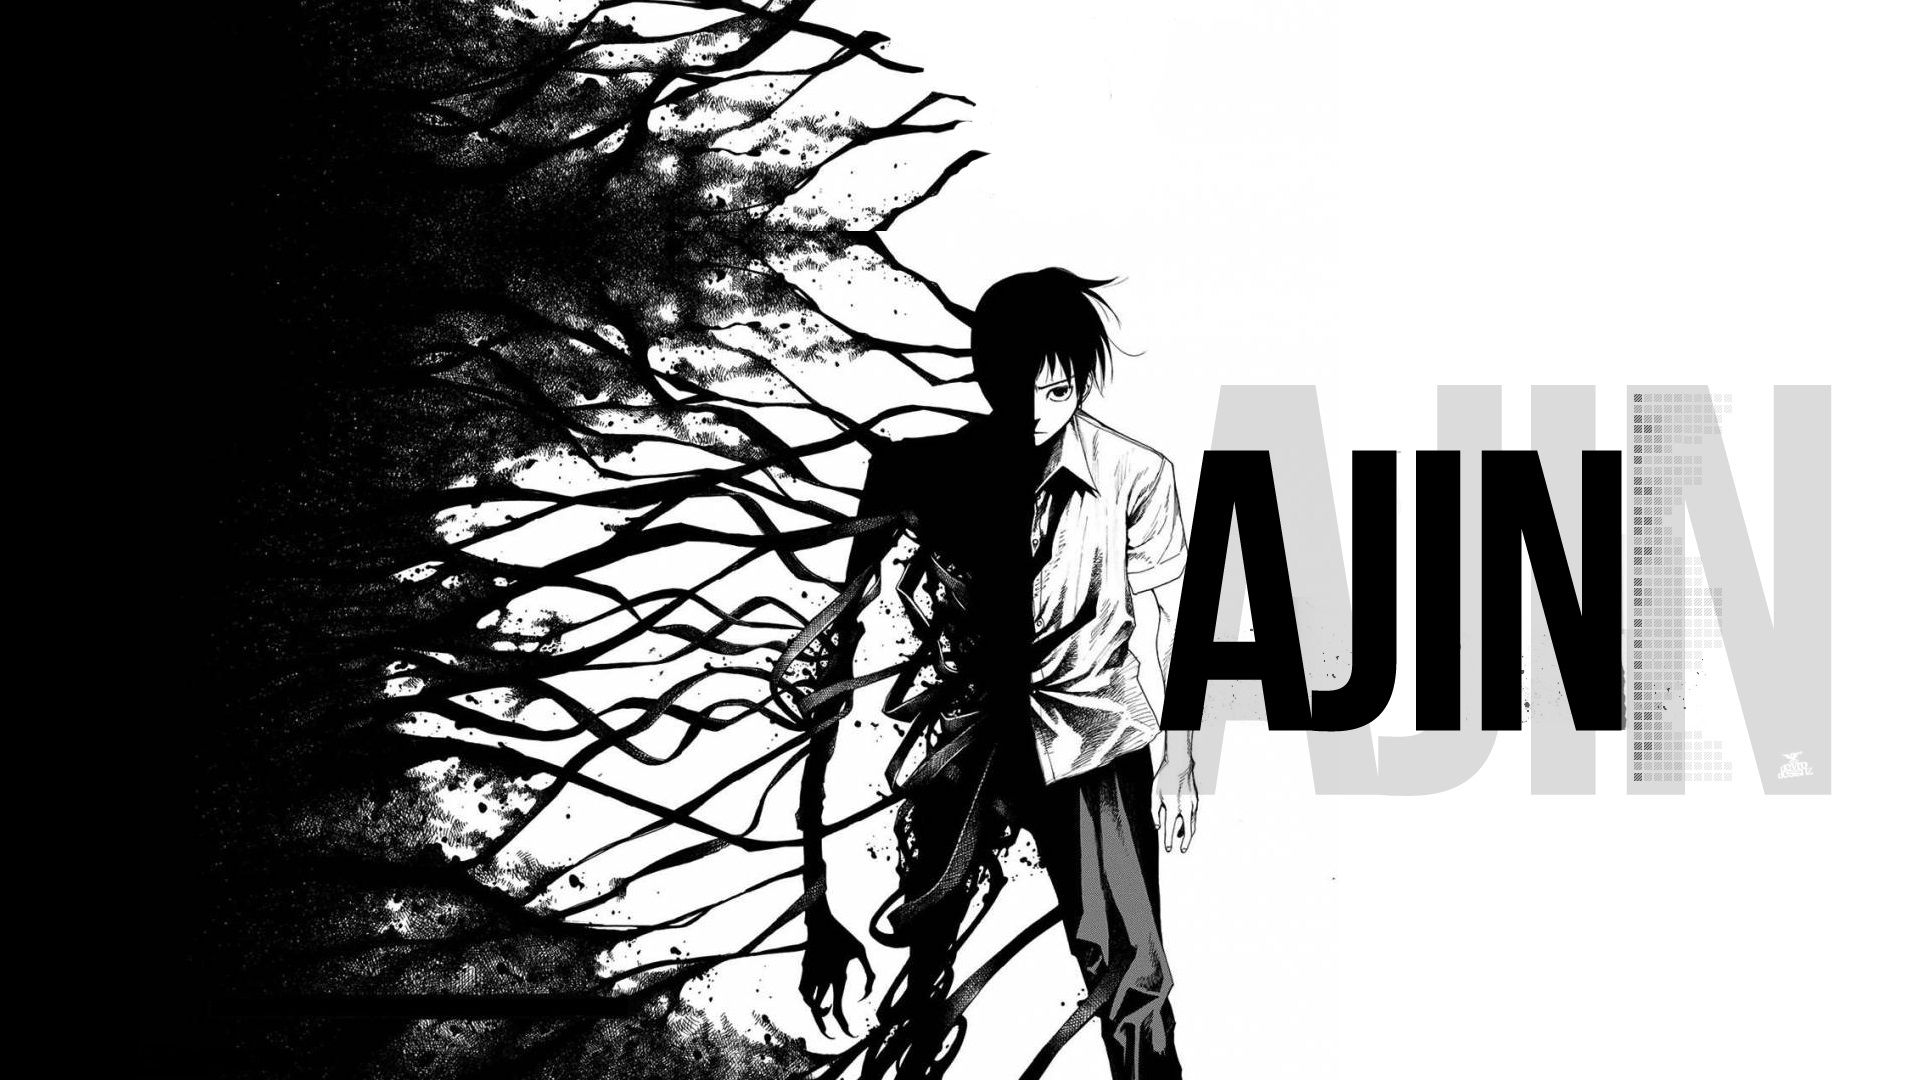 Ajin anime by Anime Confessions on Ajin Ajin, Demi human